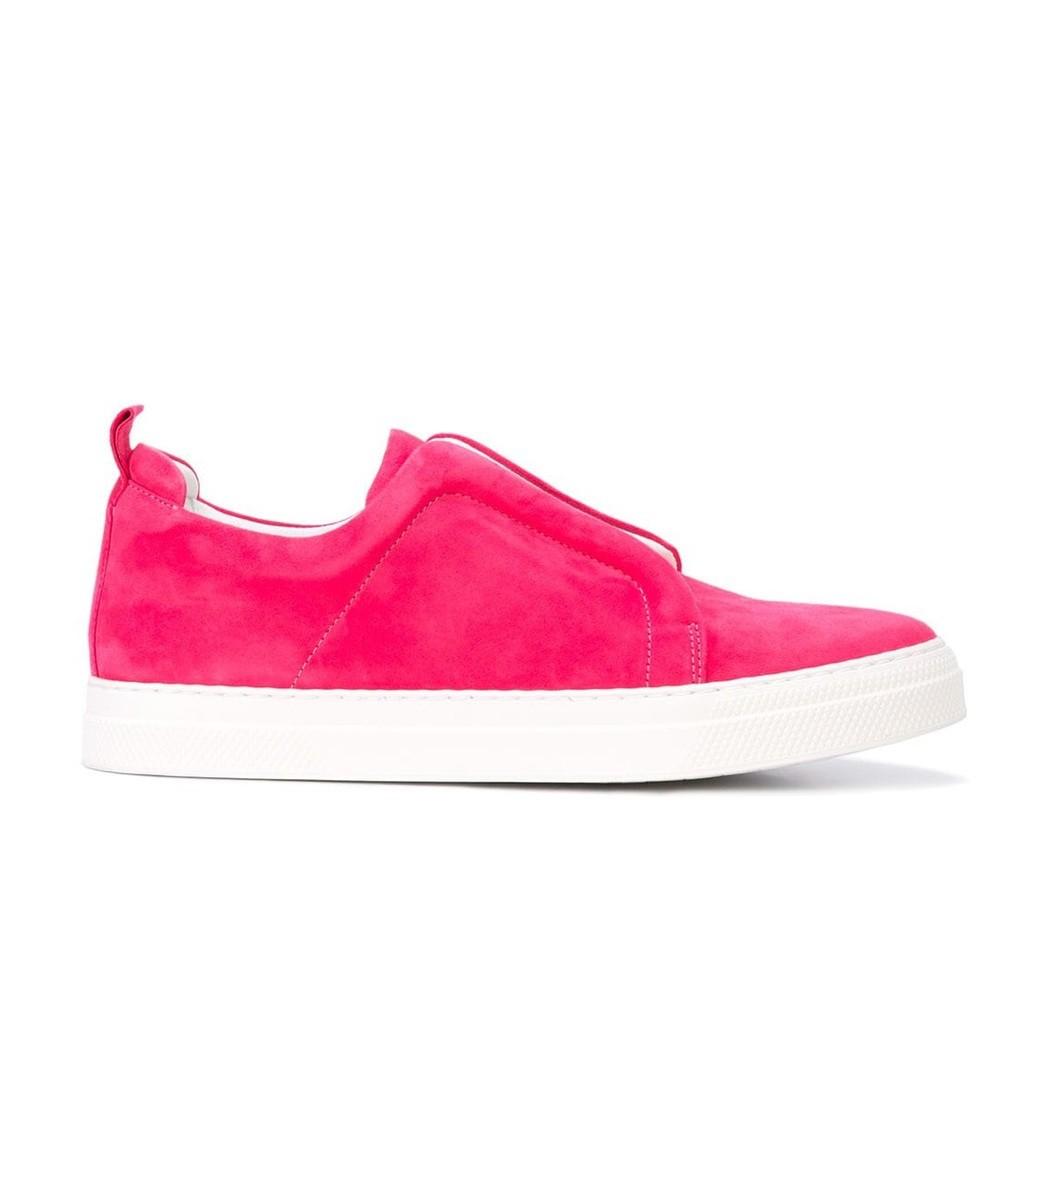 PIGALLE Pink Suede Slider Sneakers